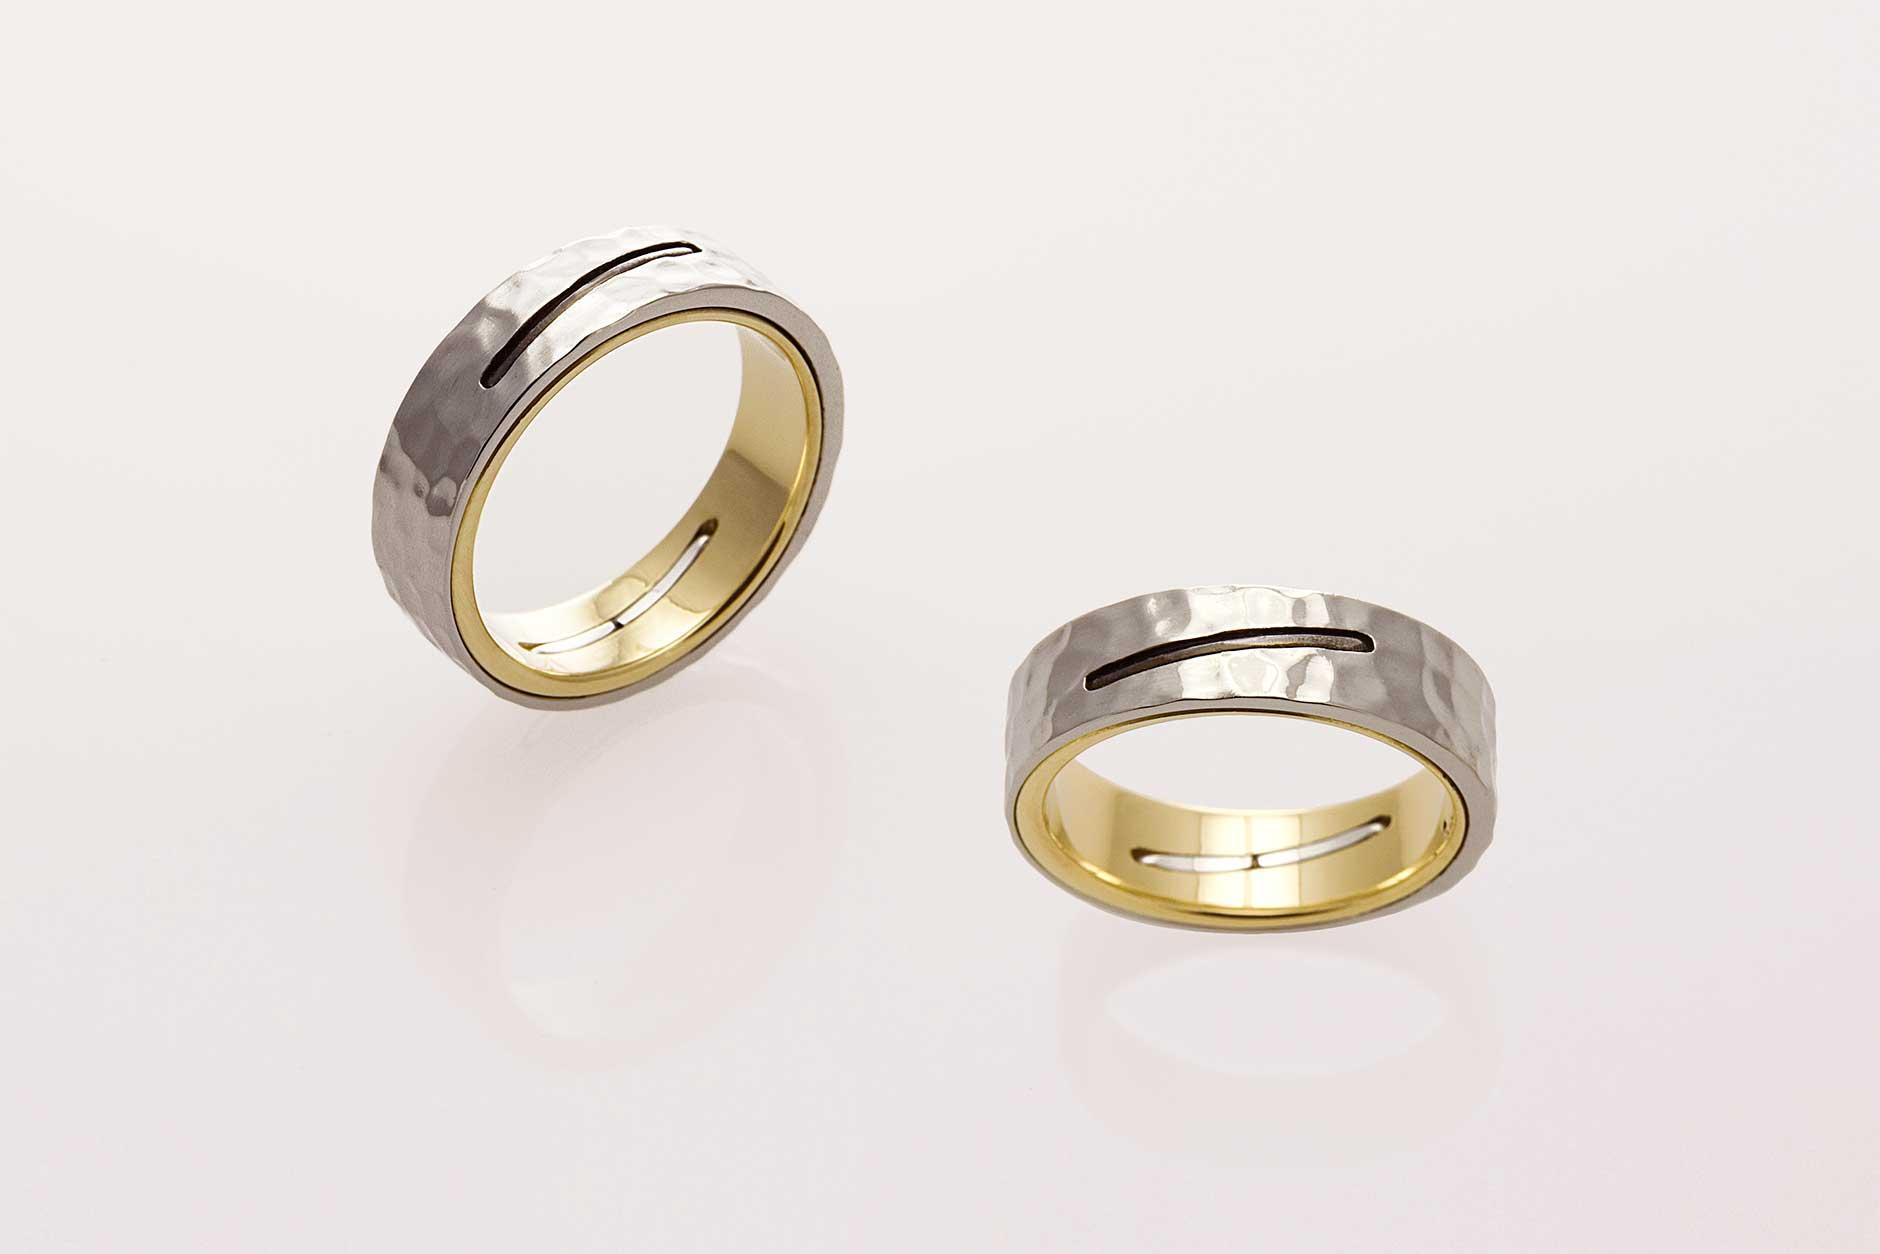 STAPLE 18k & 19k Custom Two Tone Hammered Mens Wedding Band - NÉWA Goldsmith